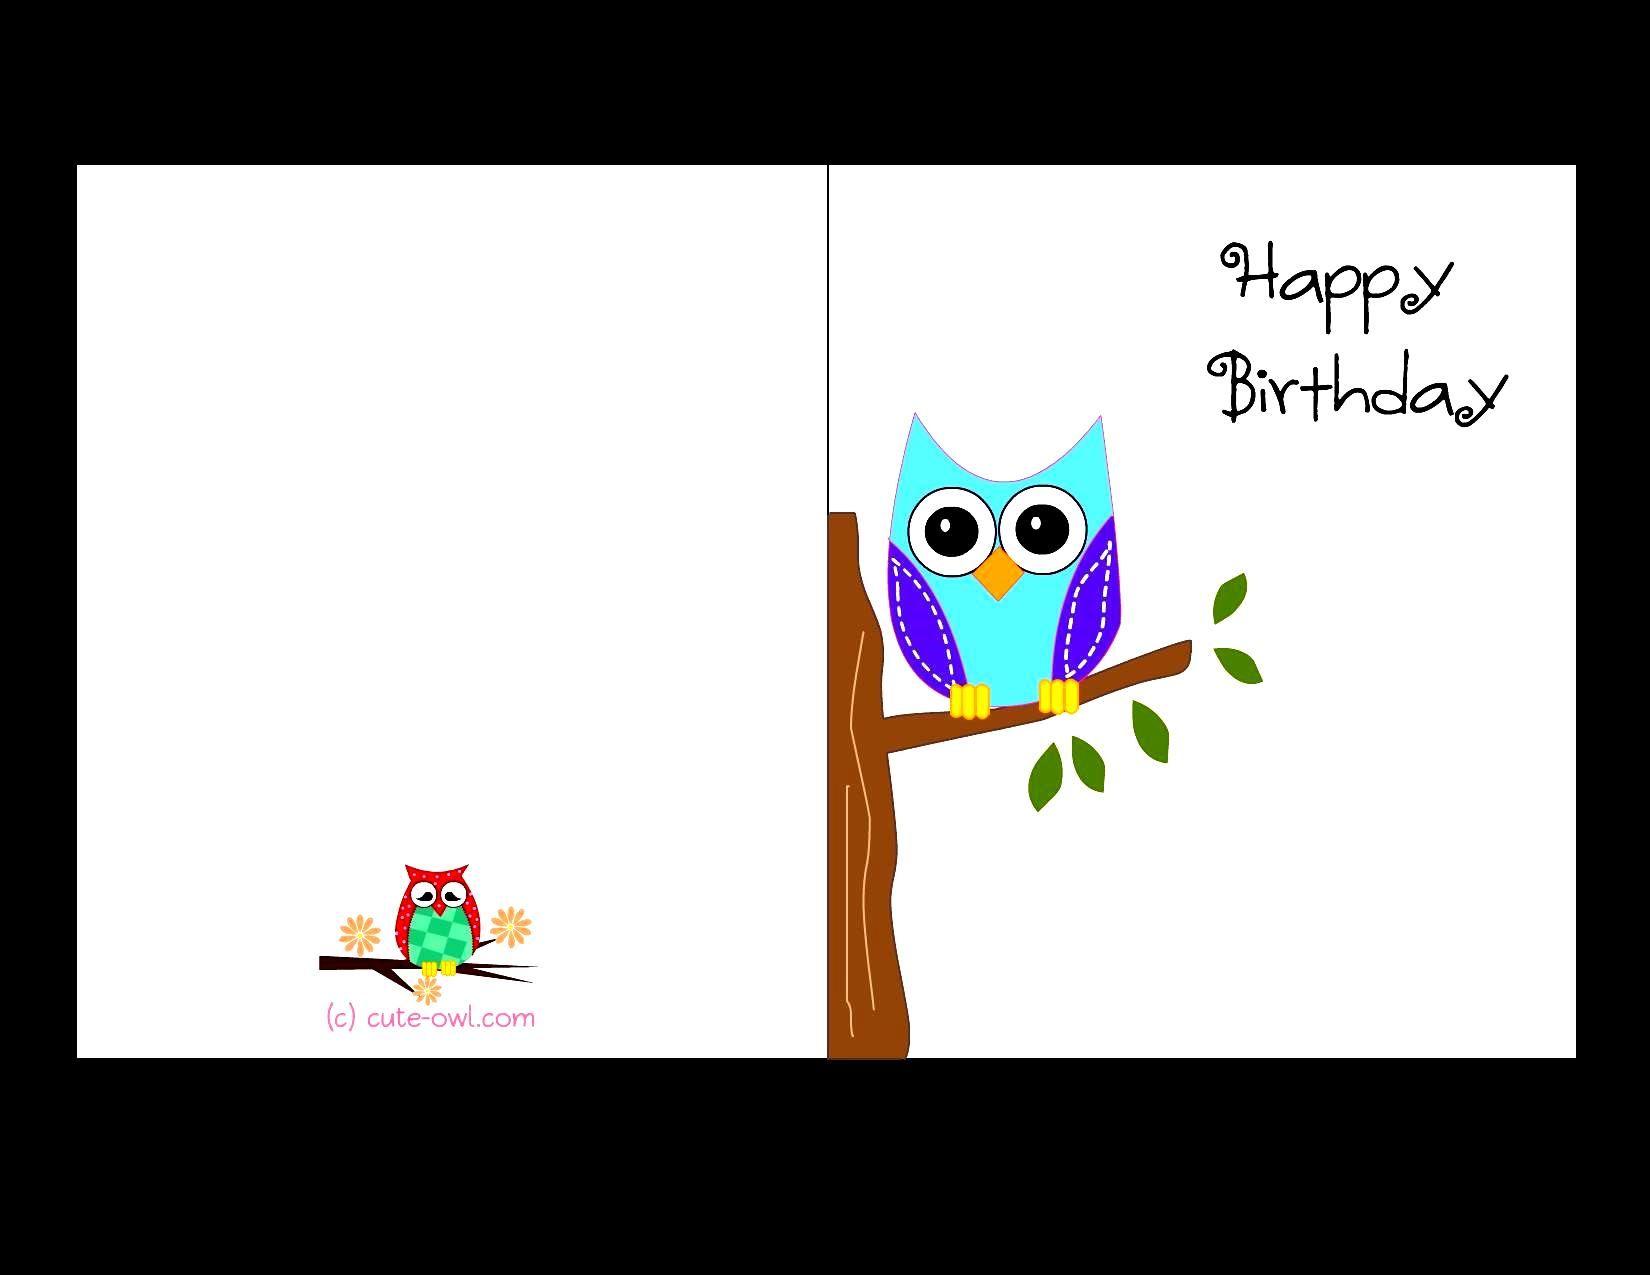 free printable birthday cards | girls things | Pinterest | Free ...